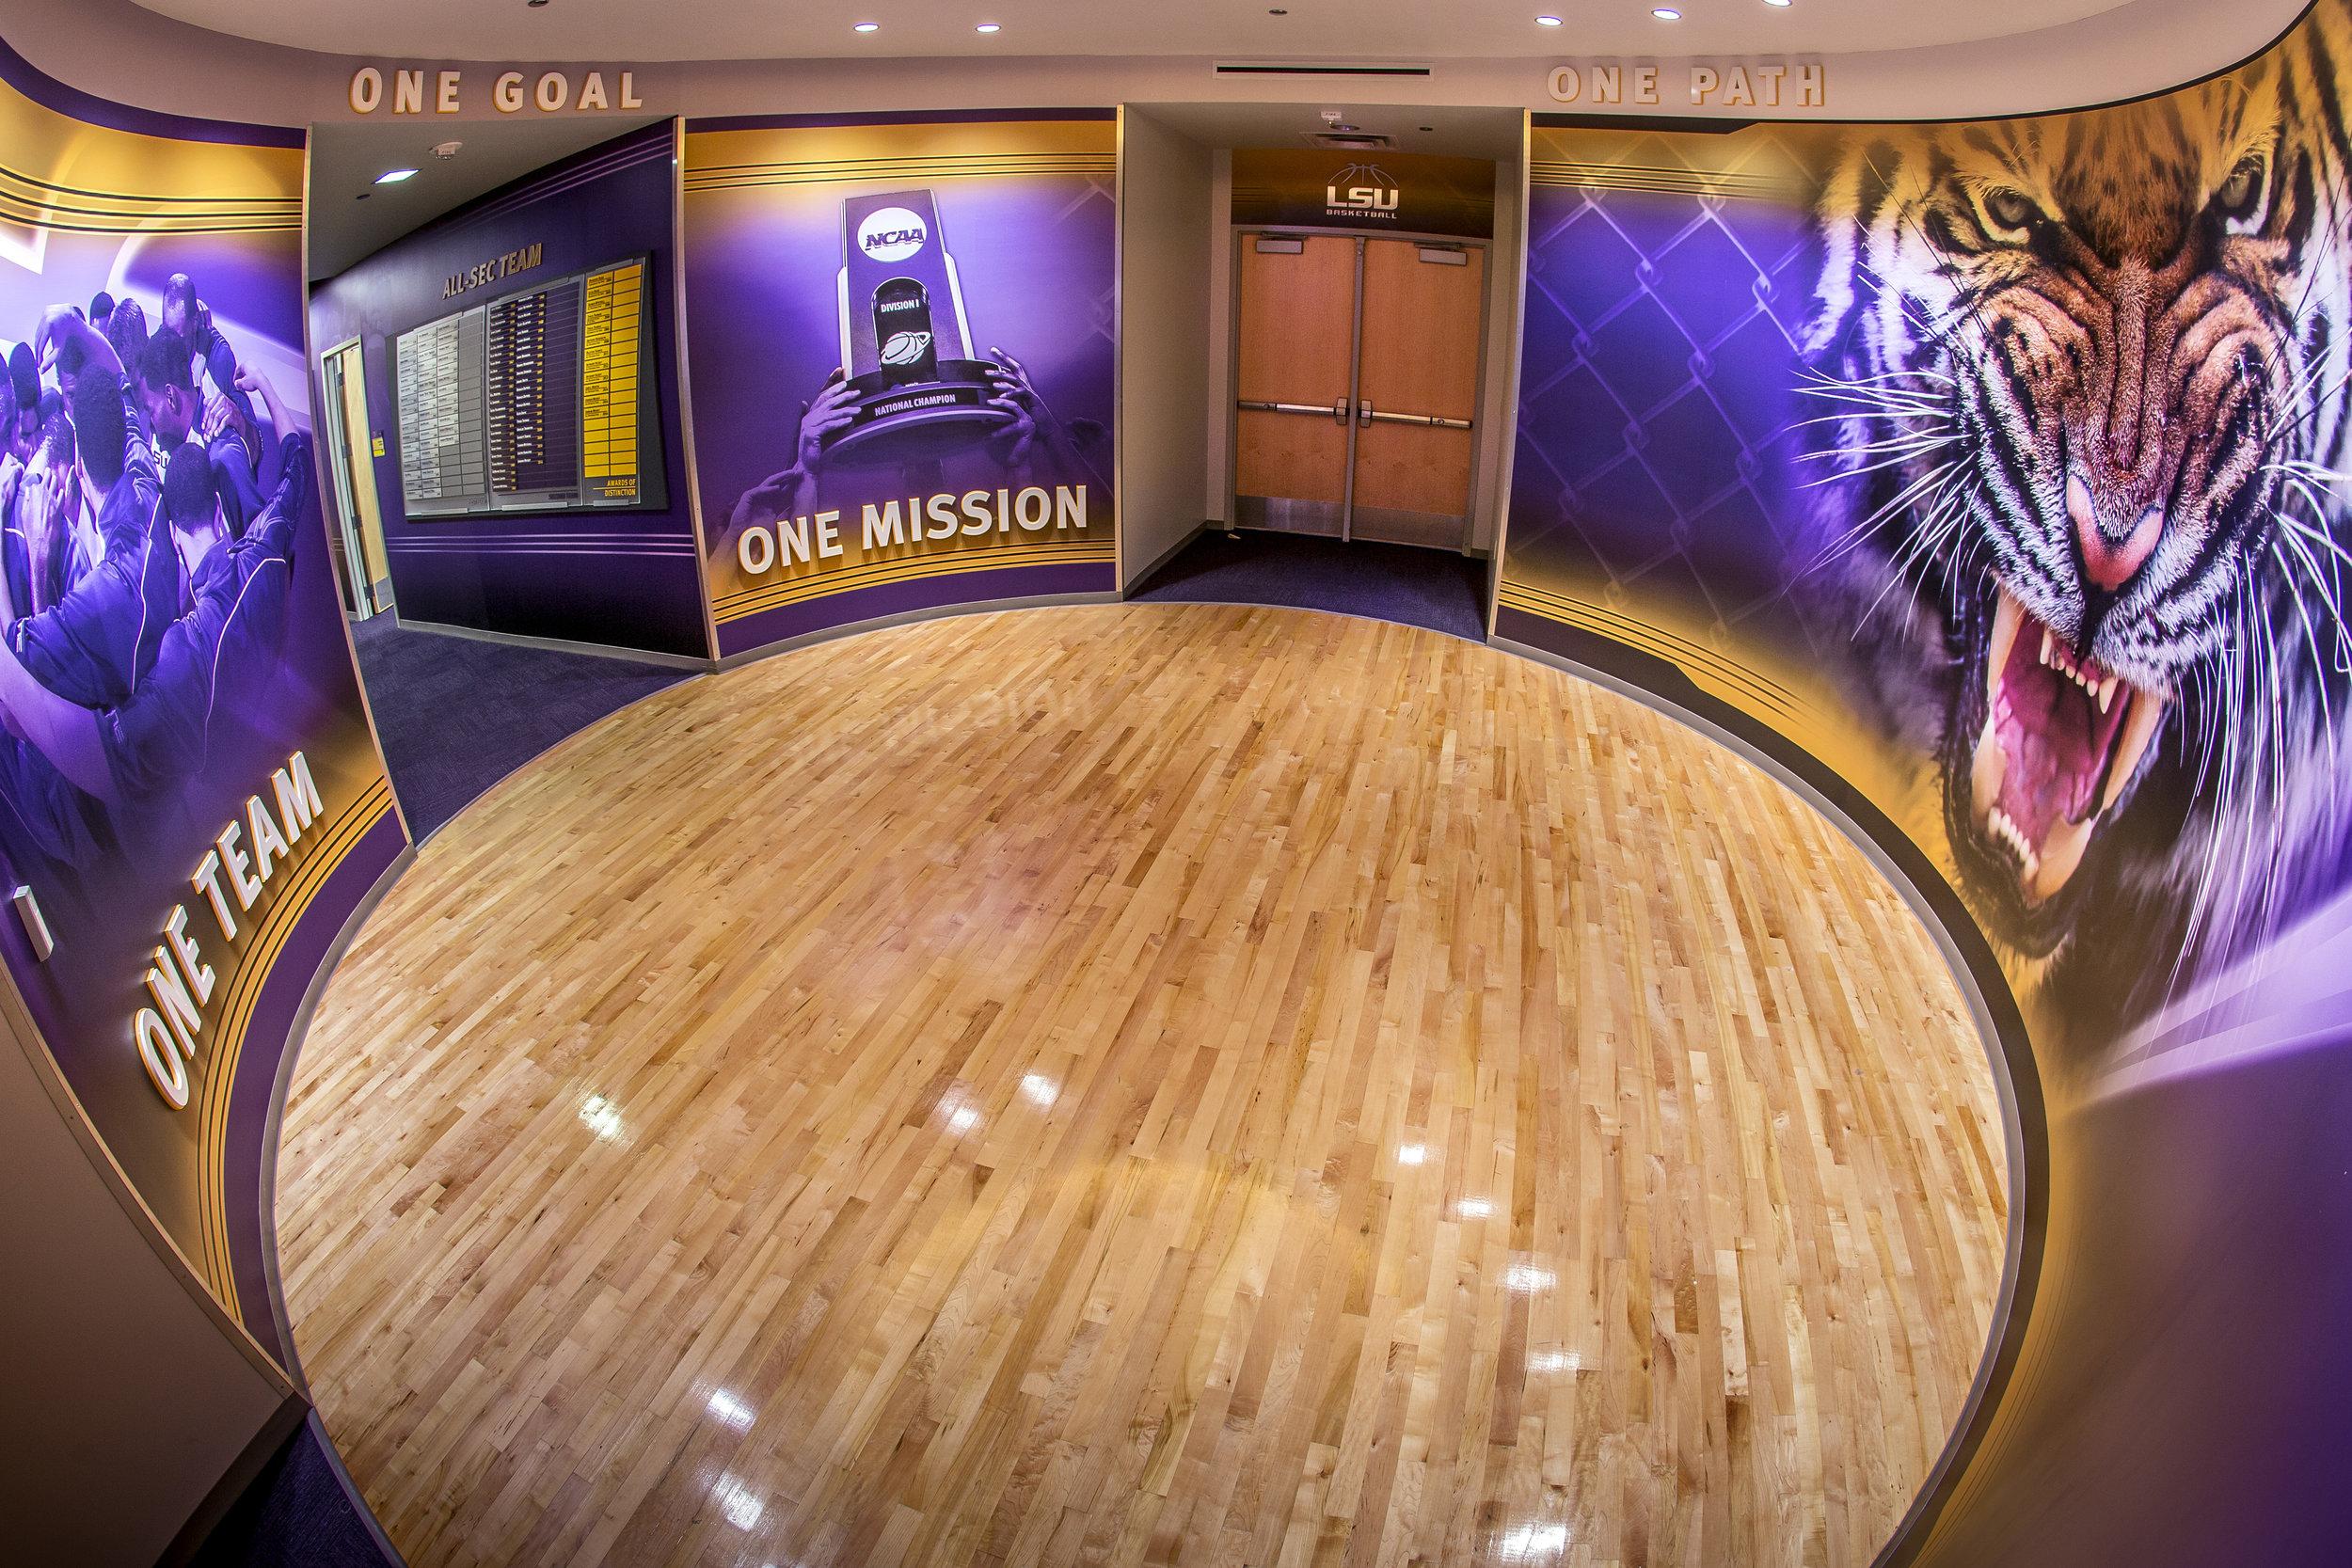 eP0201 49 Degrees - LSU Basketball Training Facility .jpg